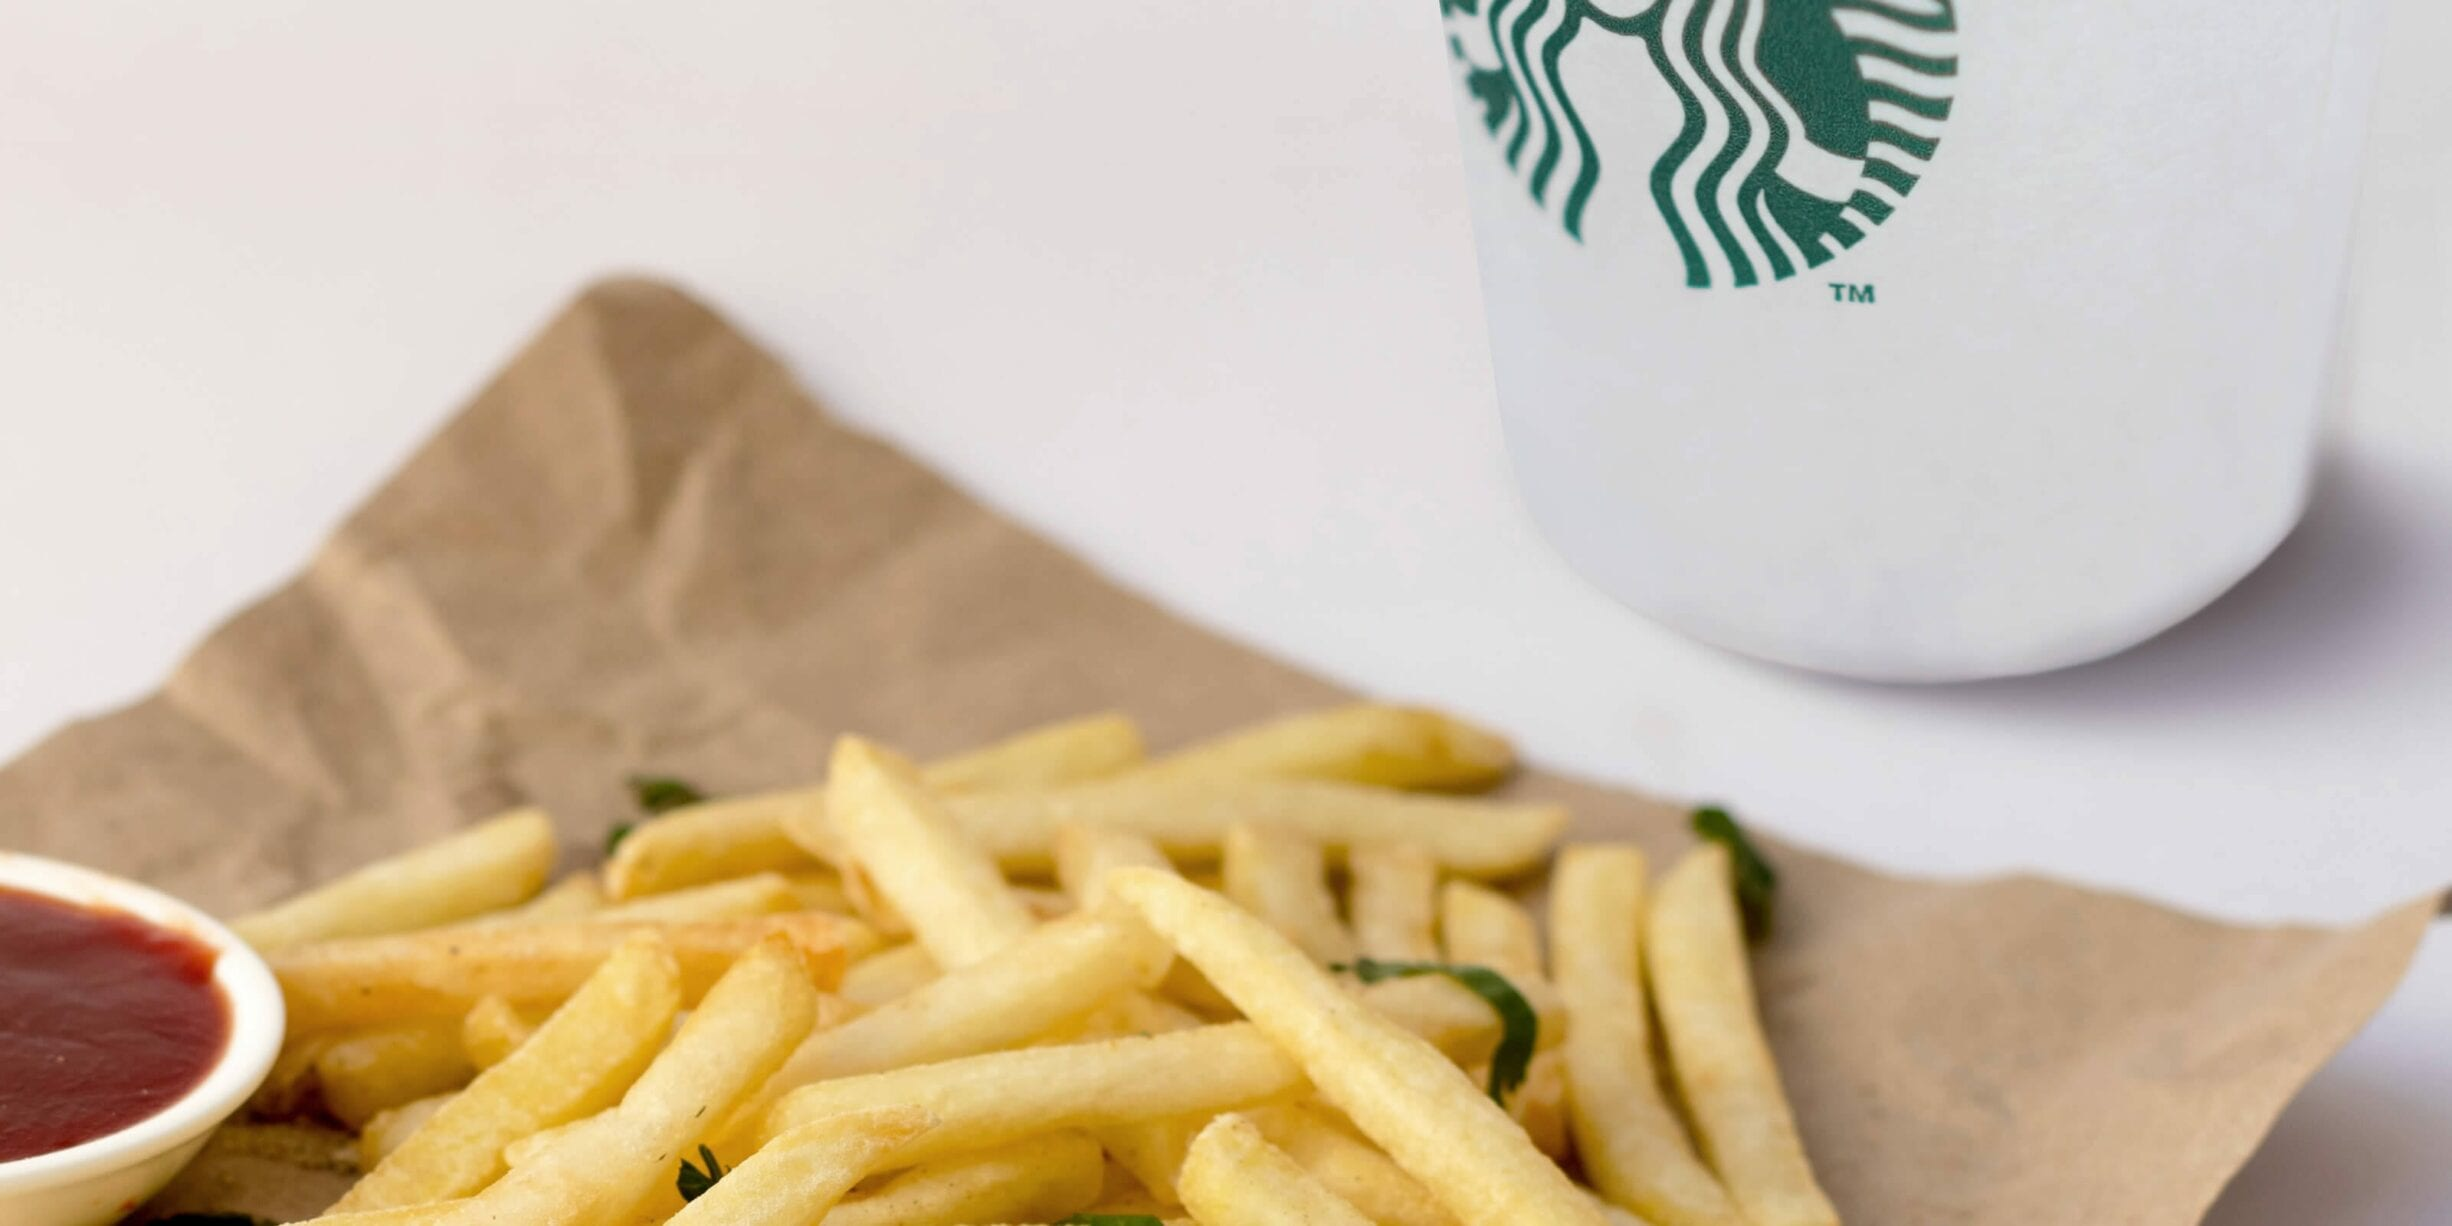 mcdonalds fries, starbucks coffee cup